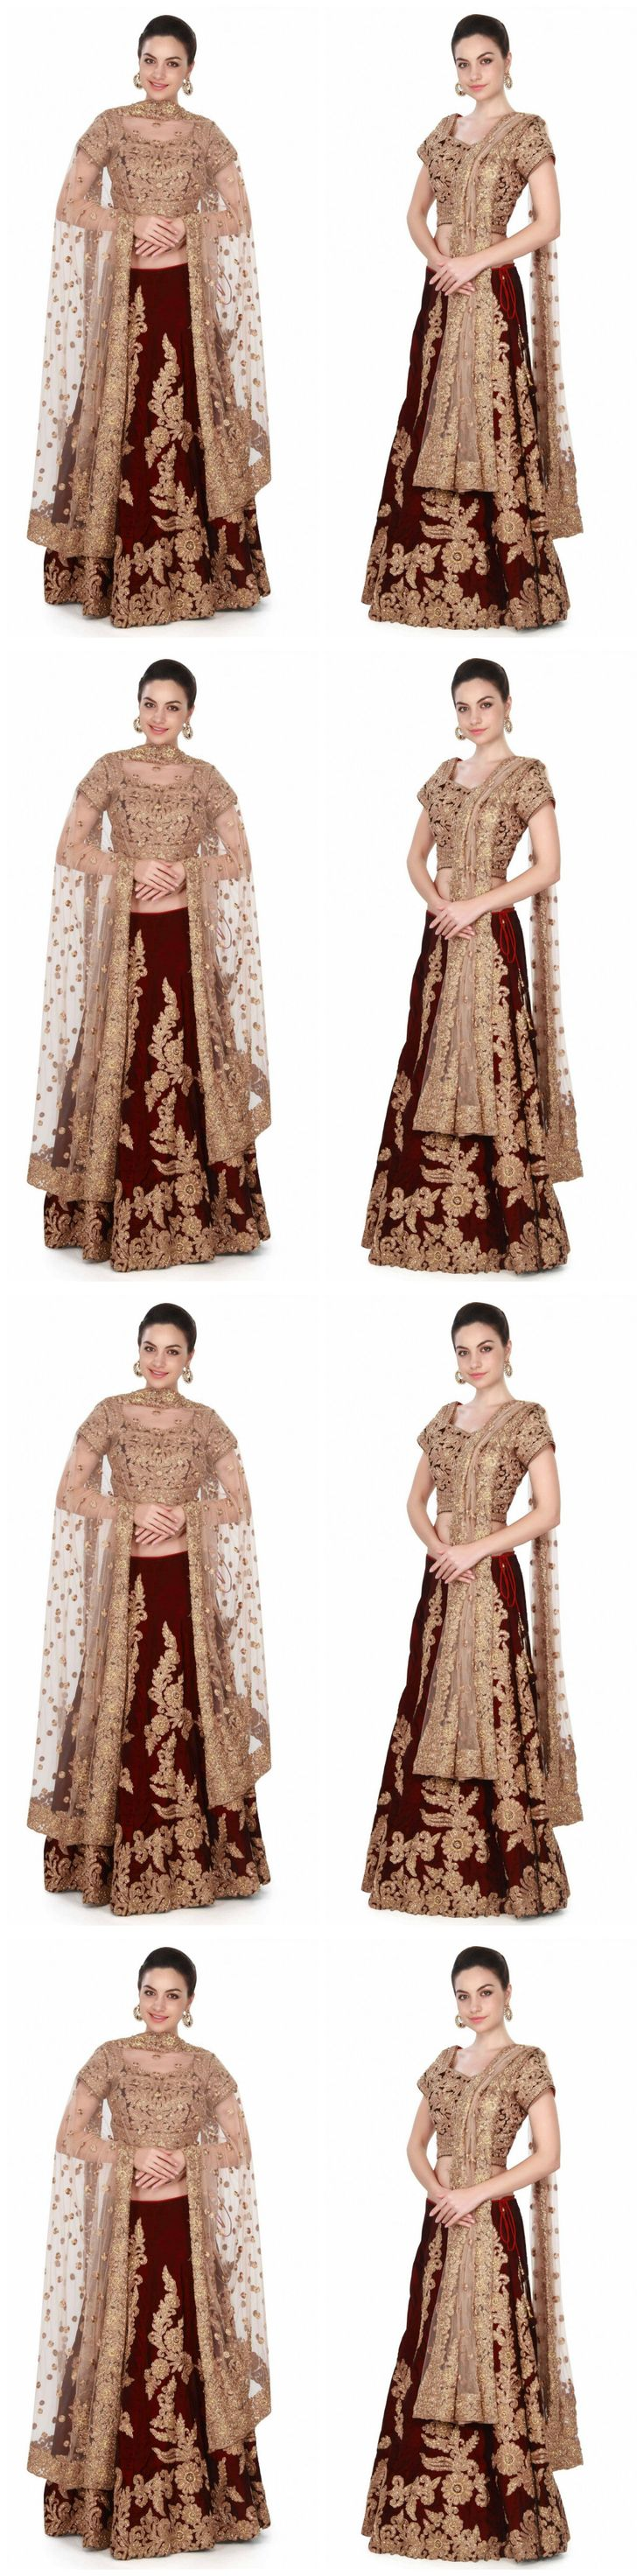 Sari Saree 155250: Designer Party Wear Indian Wedding Bridal Bollywood New Lehenga Choli Saree Sari -> BUY IT NOW ONLY: $72 on eBay!